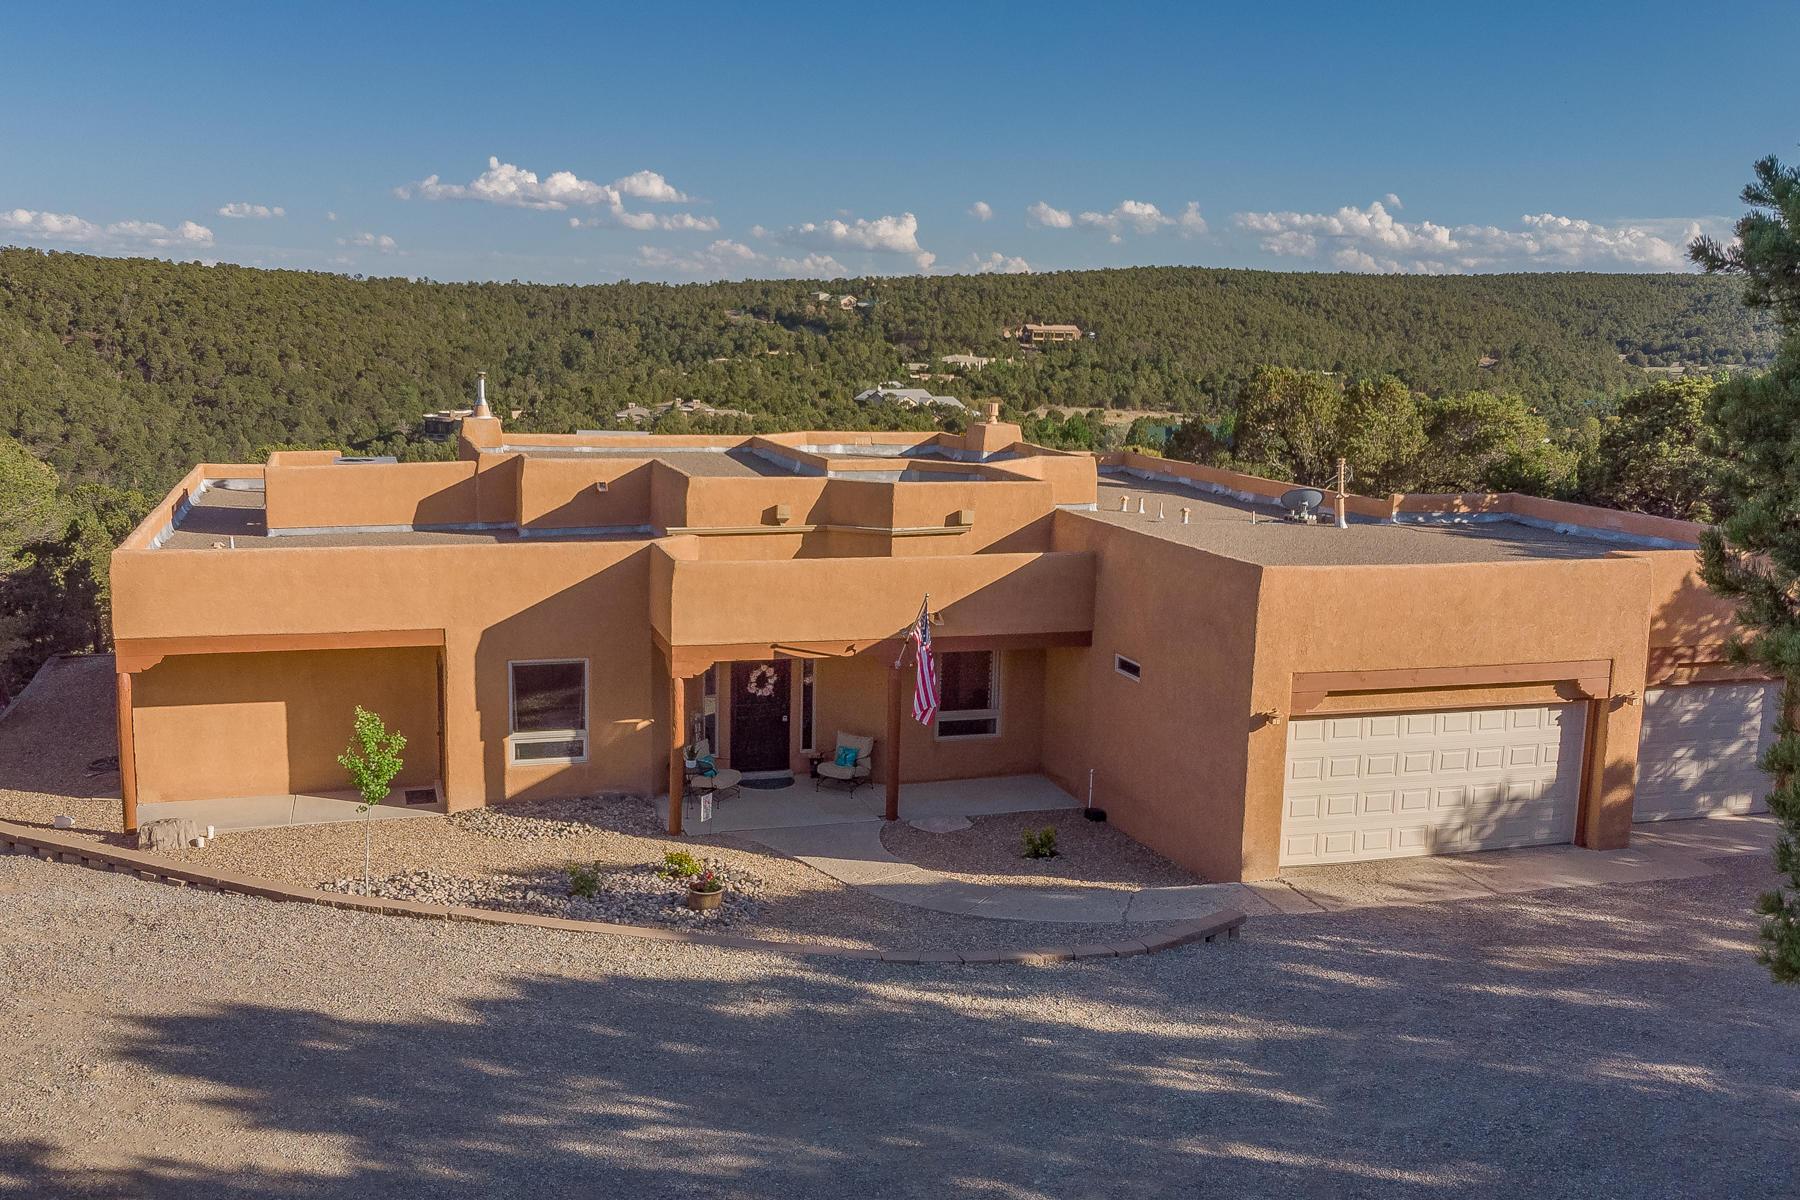 35 RANCHO VERDE Property Photo - Tijeras, NM real estate listing